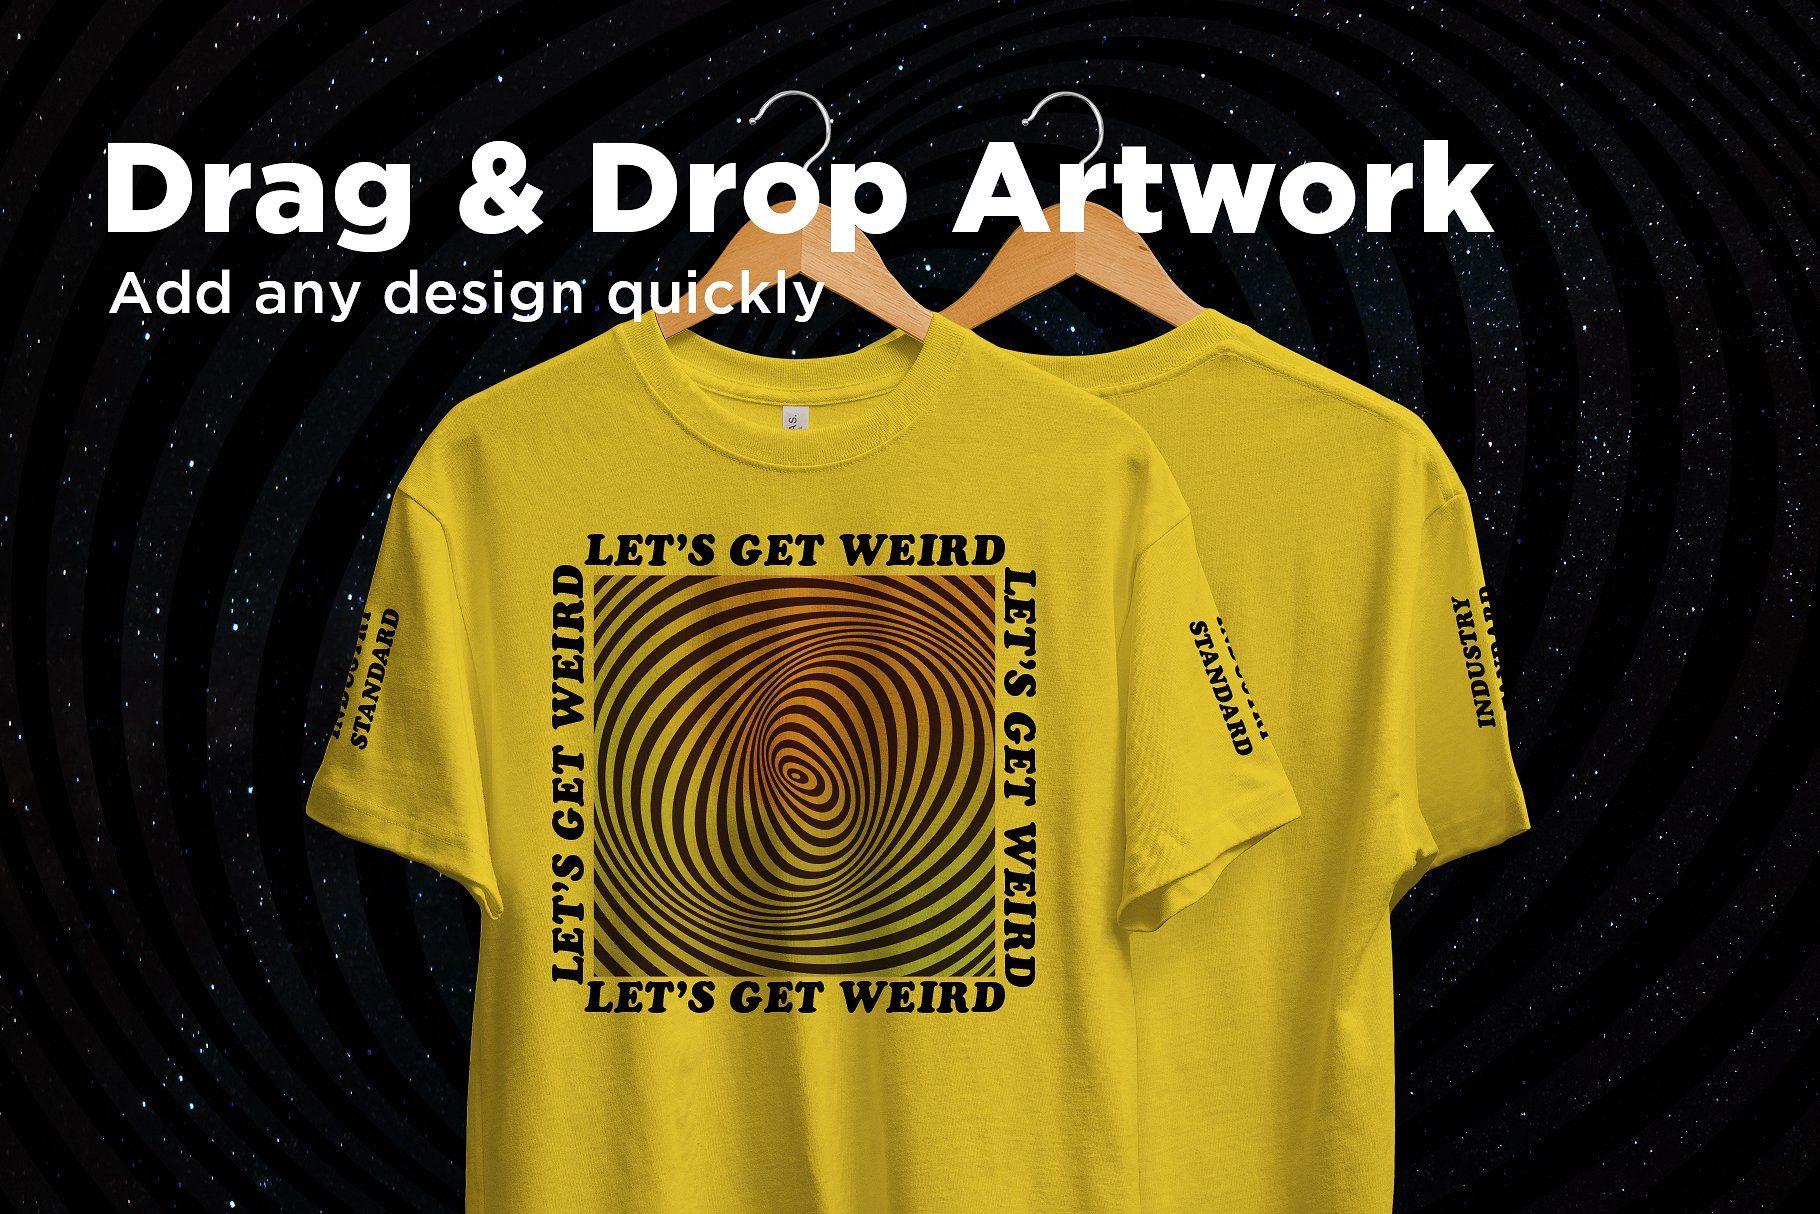 Download Oversized Street Tee Mockup Tees Oversized Graphic Design Photoshop